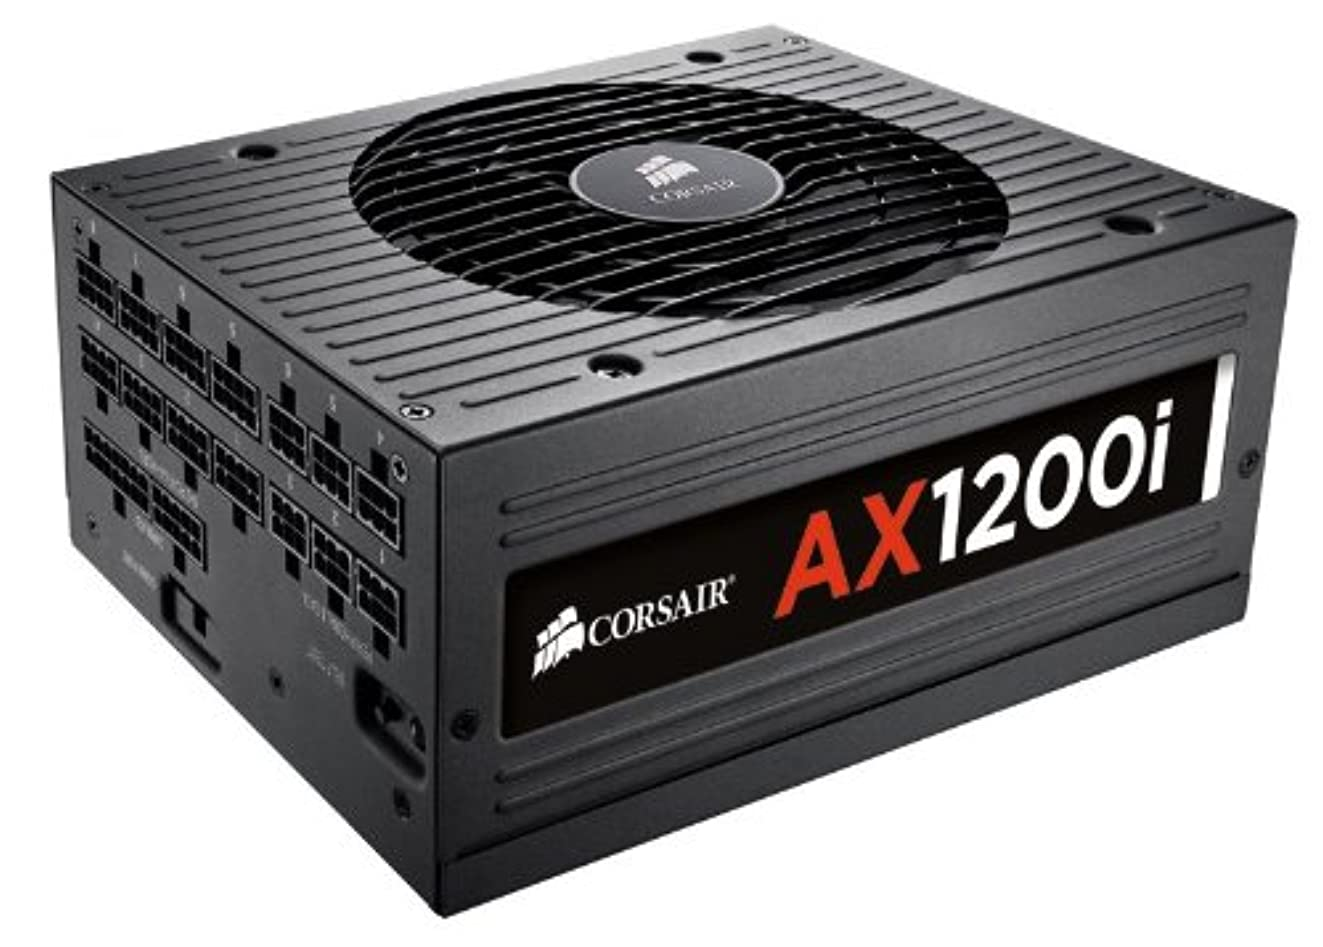 CORSAIR AXi Series, AX1200i, 1200 Watt, 80+ Platinum Certified, Fully Modular - Digital Power Supply